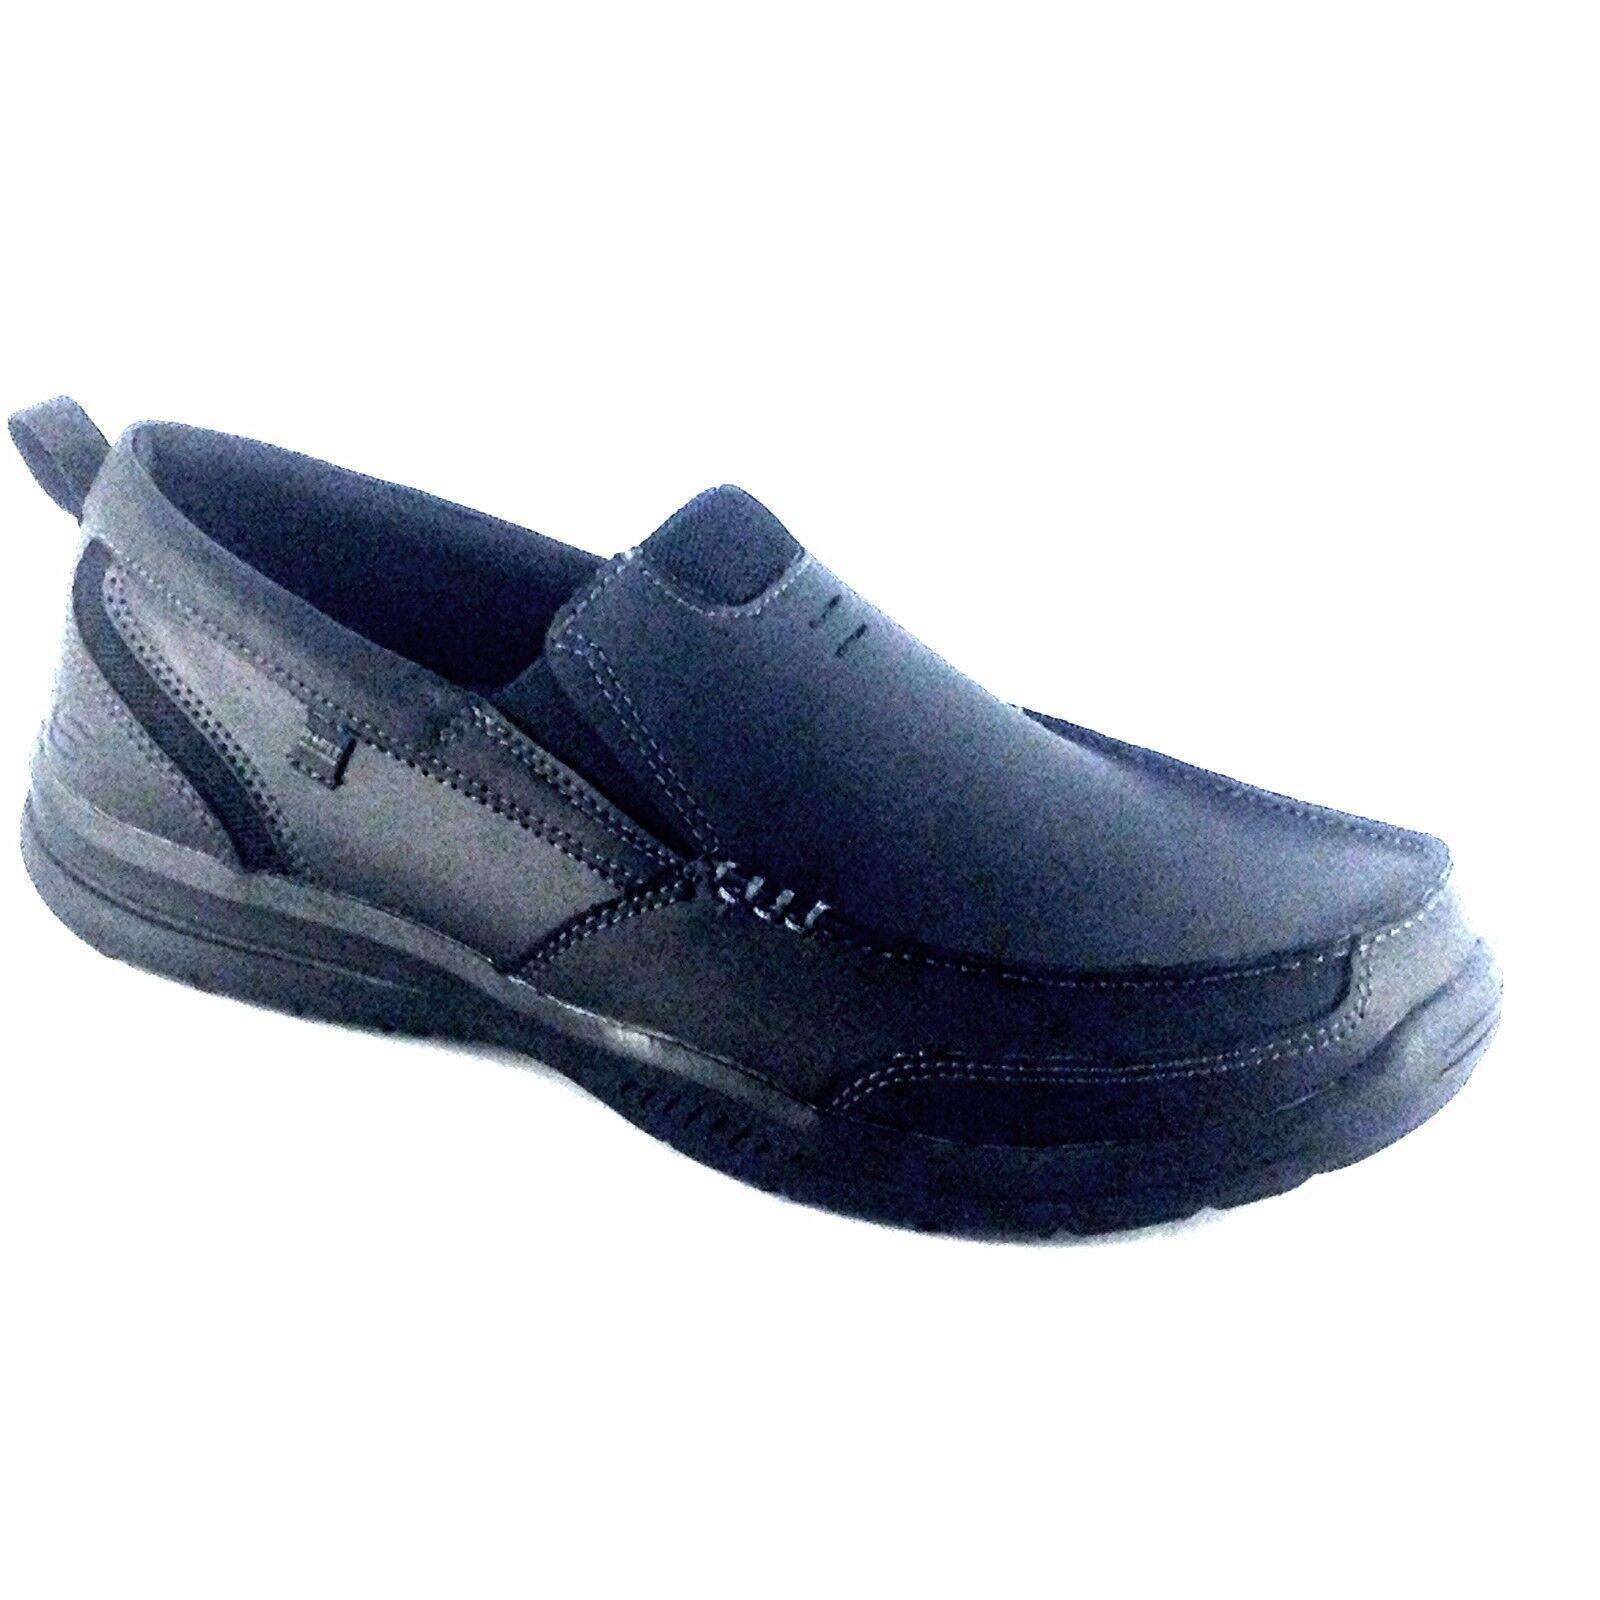 64655 BLK, MEMORY FOAM, élu-Brano SKECHERS Chaussures Hommes